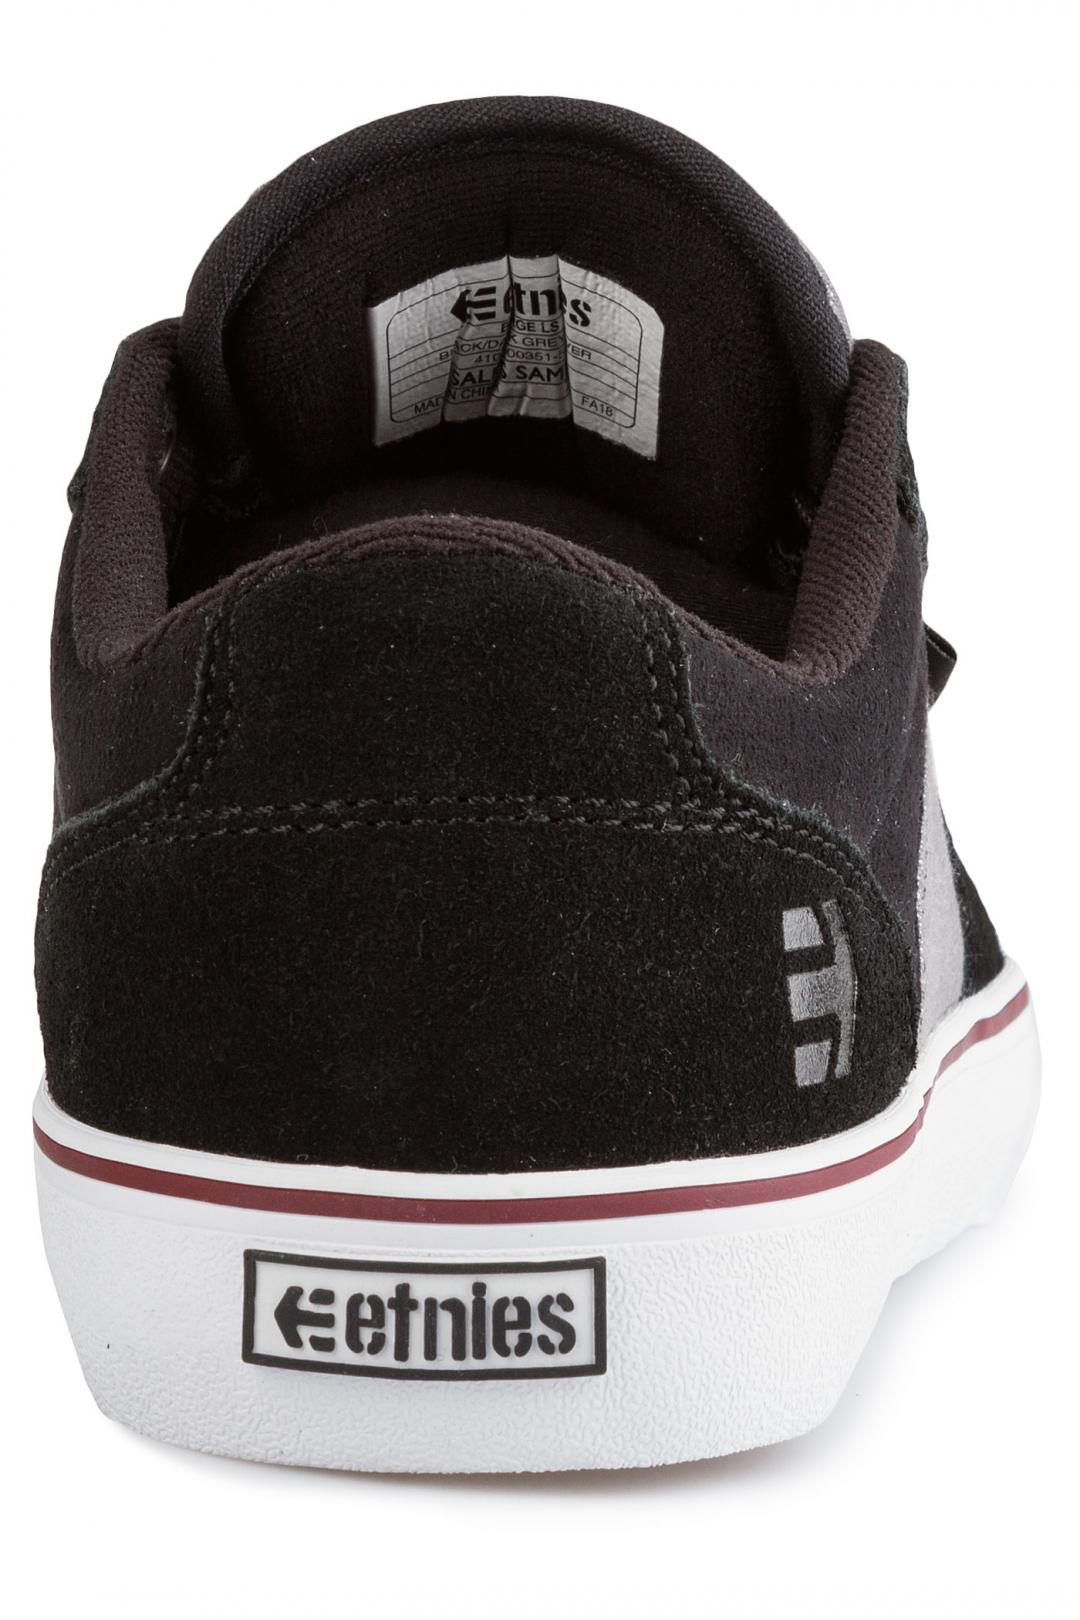 Uomo Etnies Barge LS black dark grey silver | Sneaker